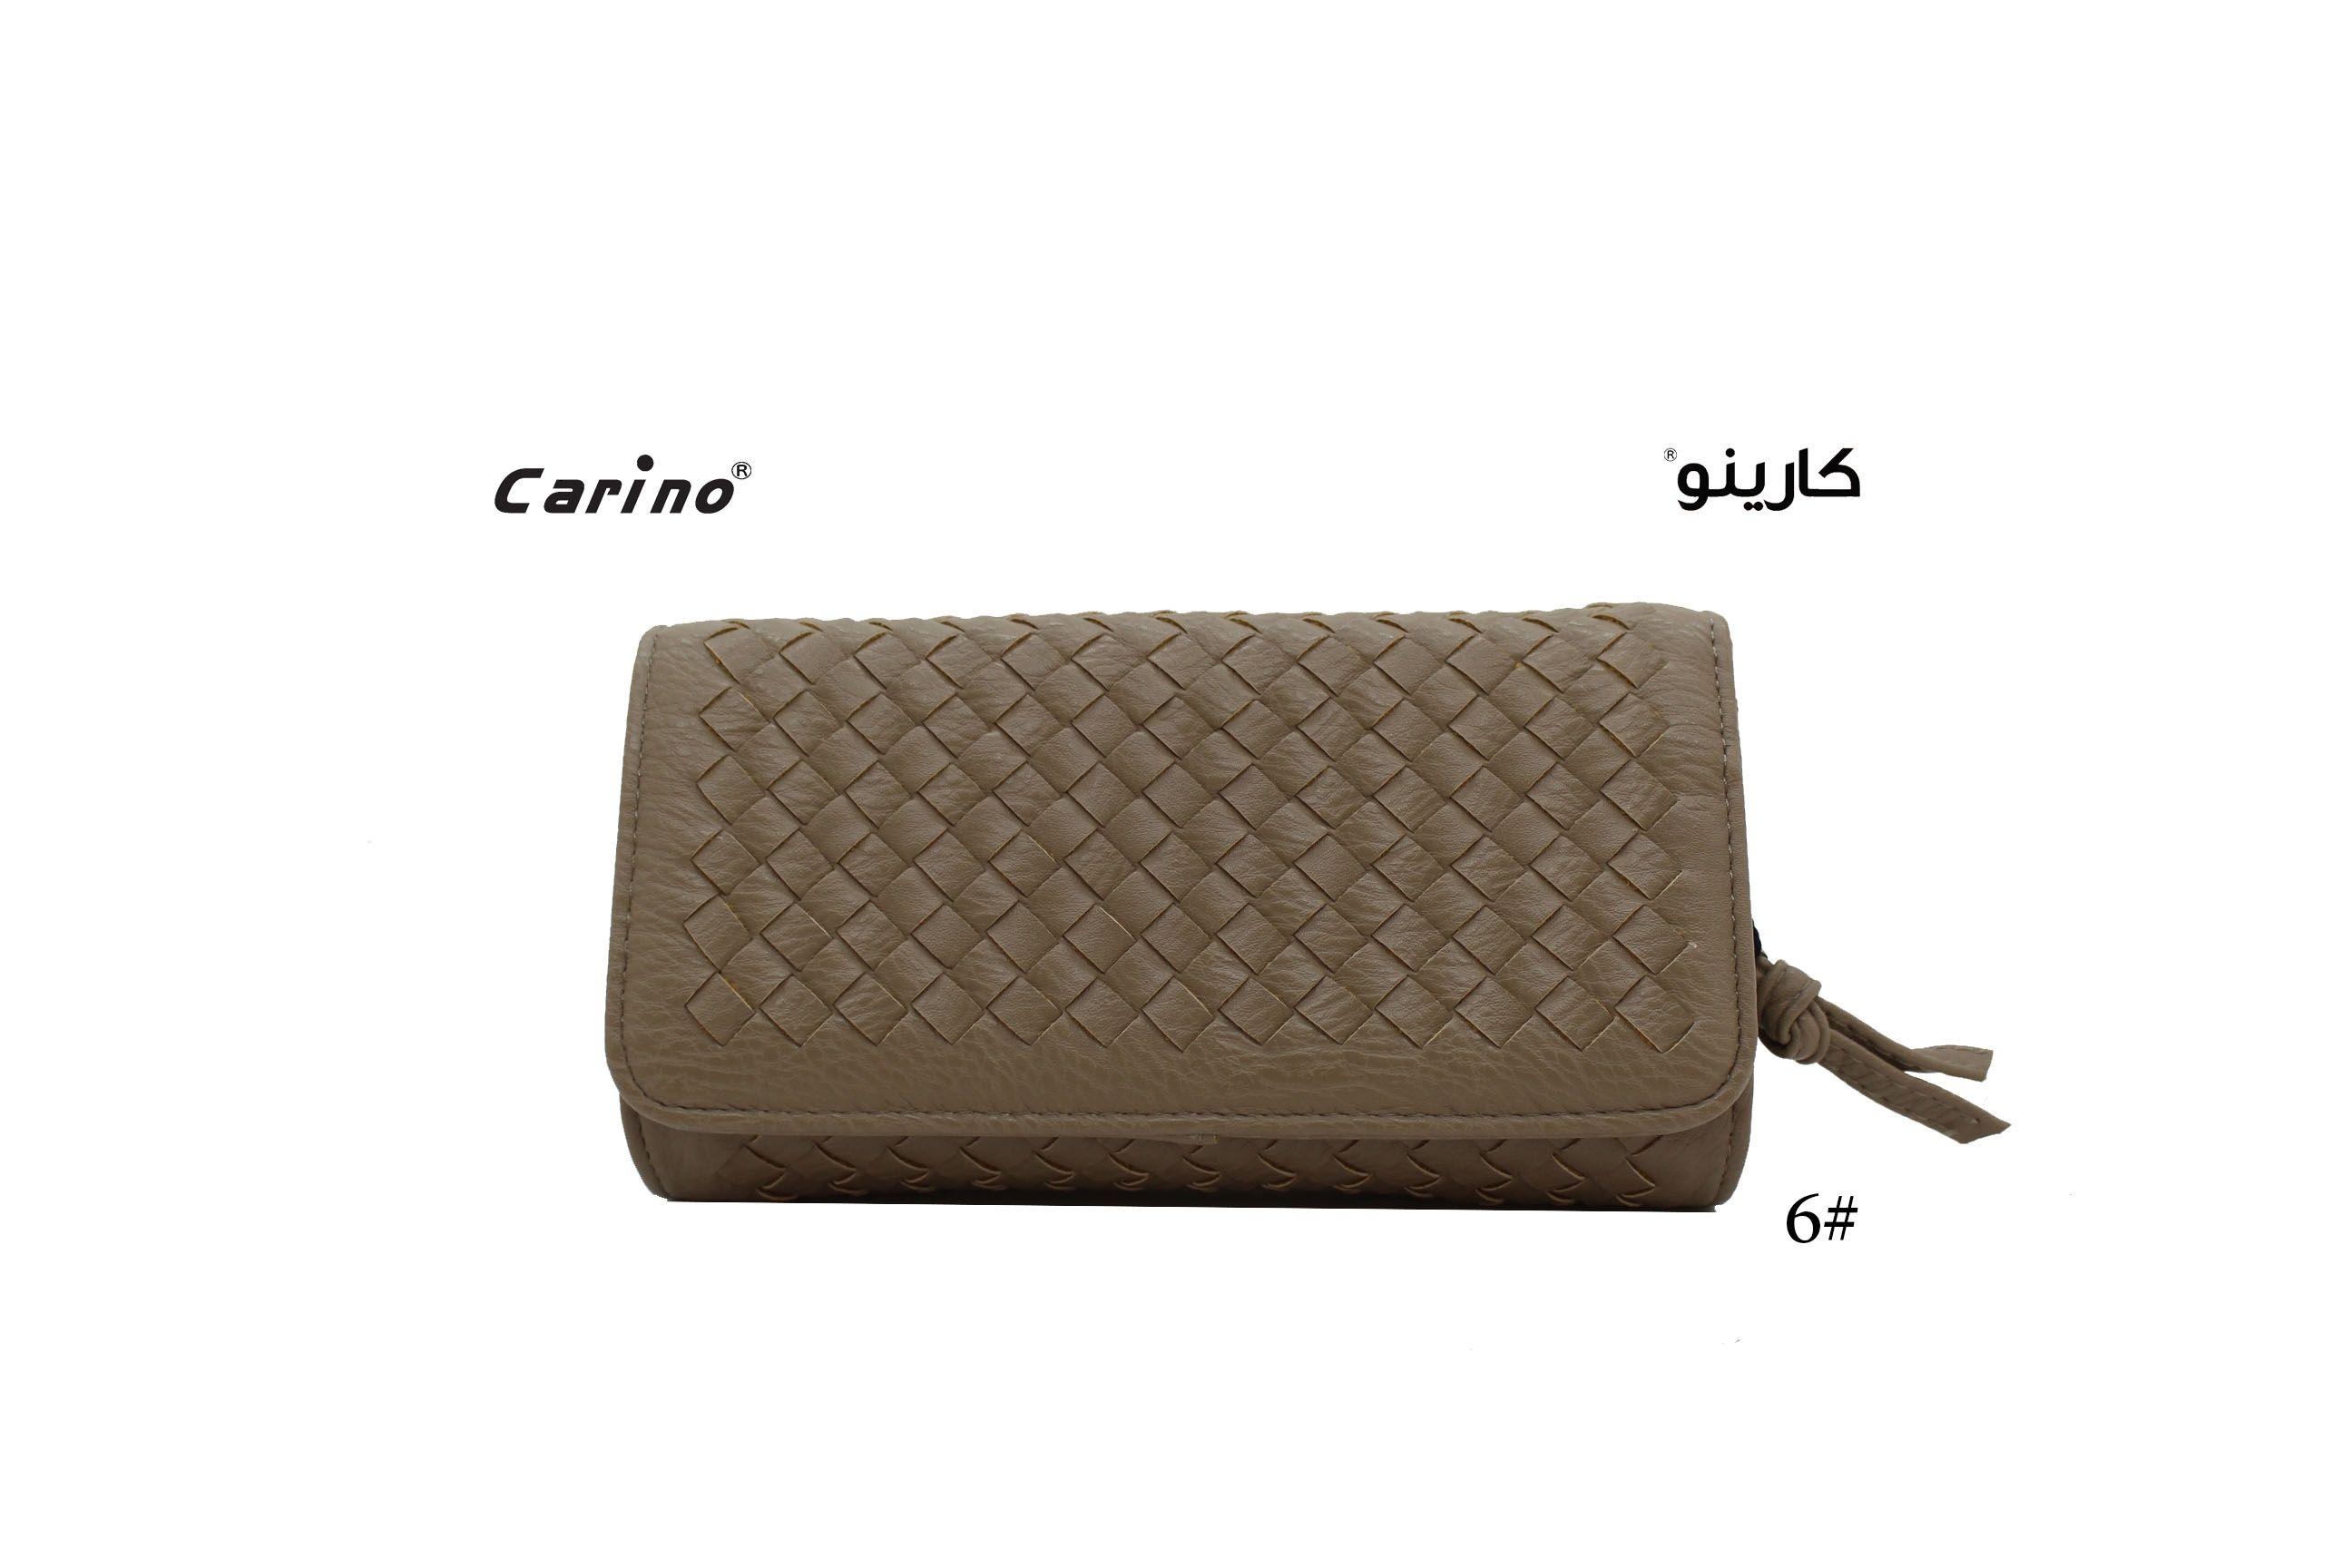 شنطة كارينو صغير كارينو Bags Wristlet Fashion